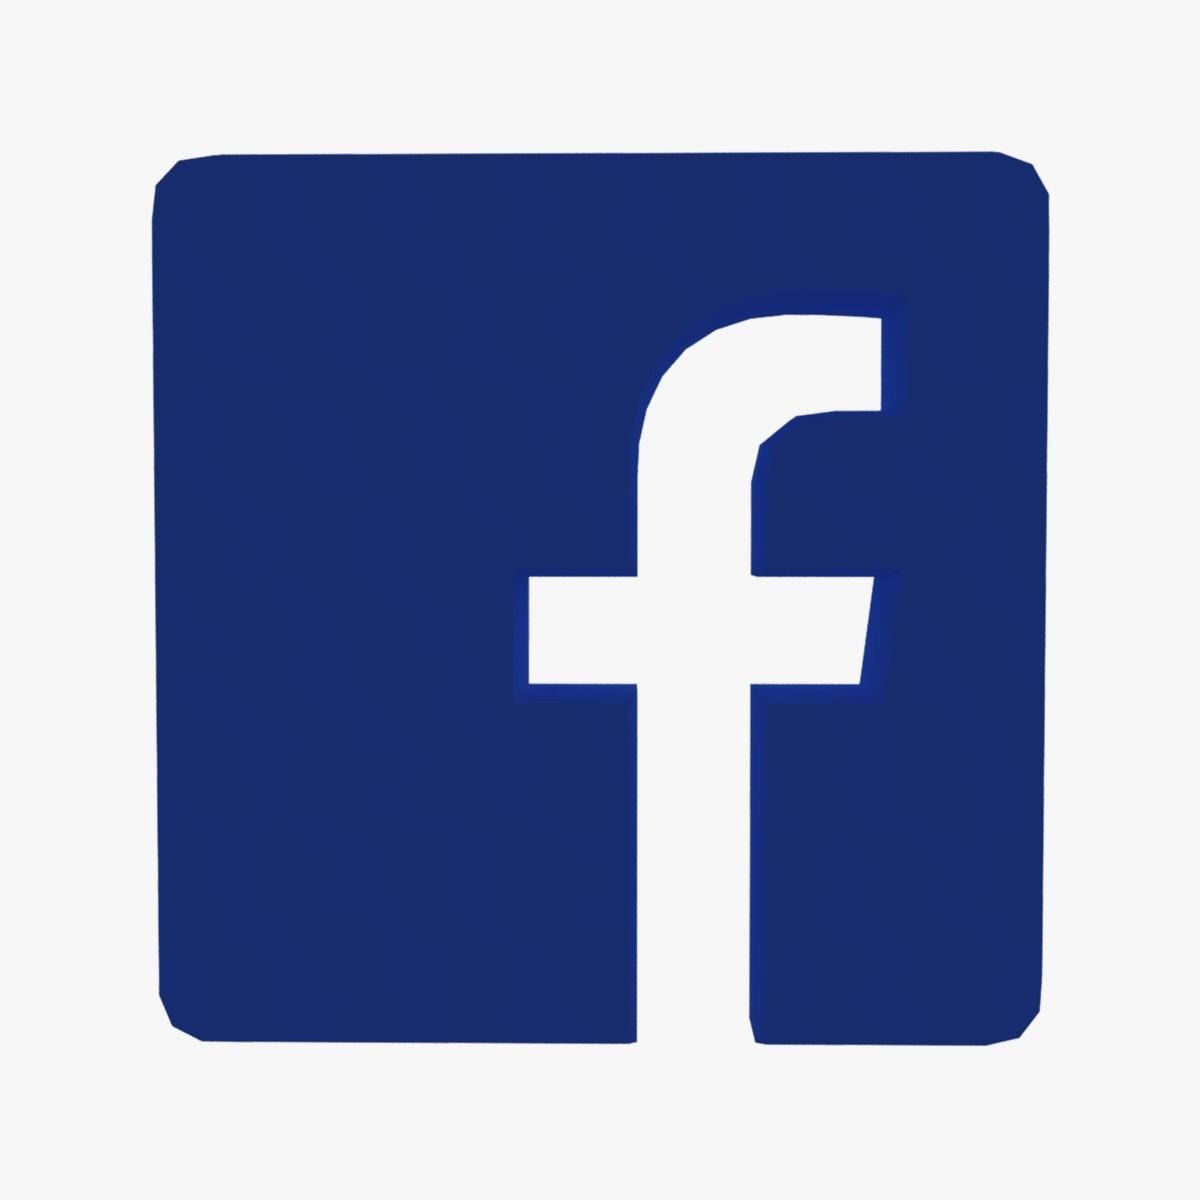 facebook logo 3d model